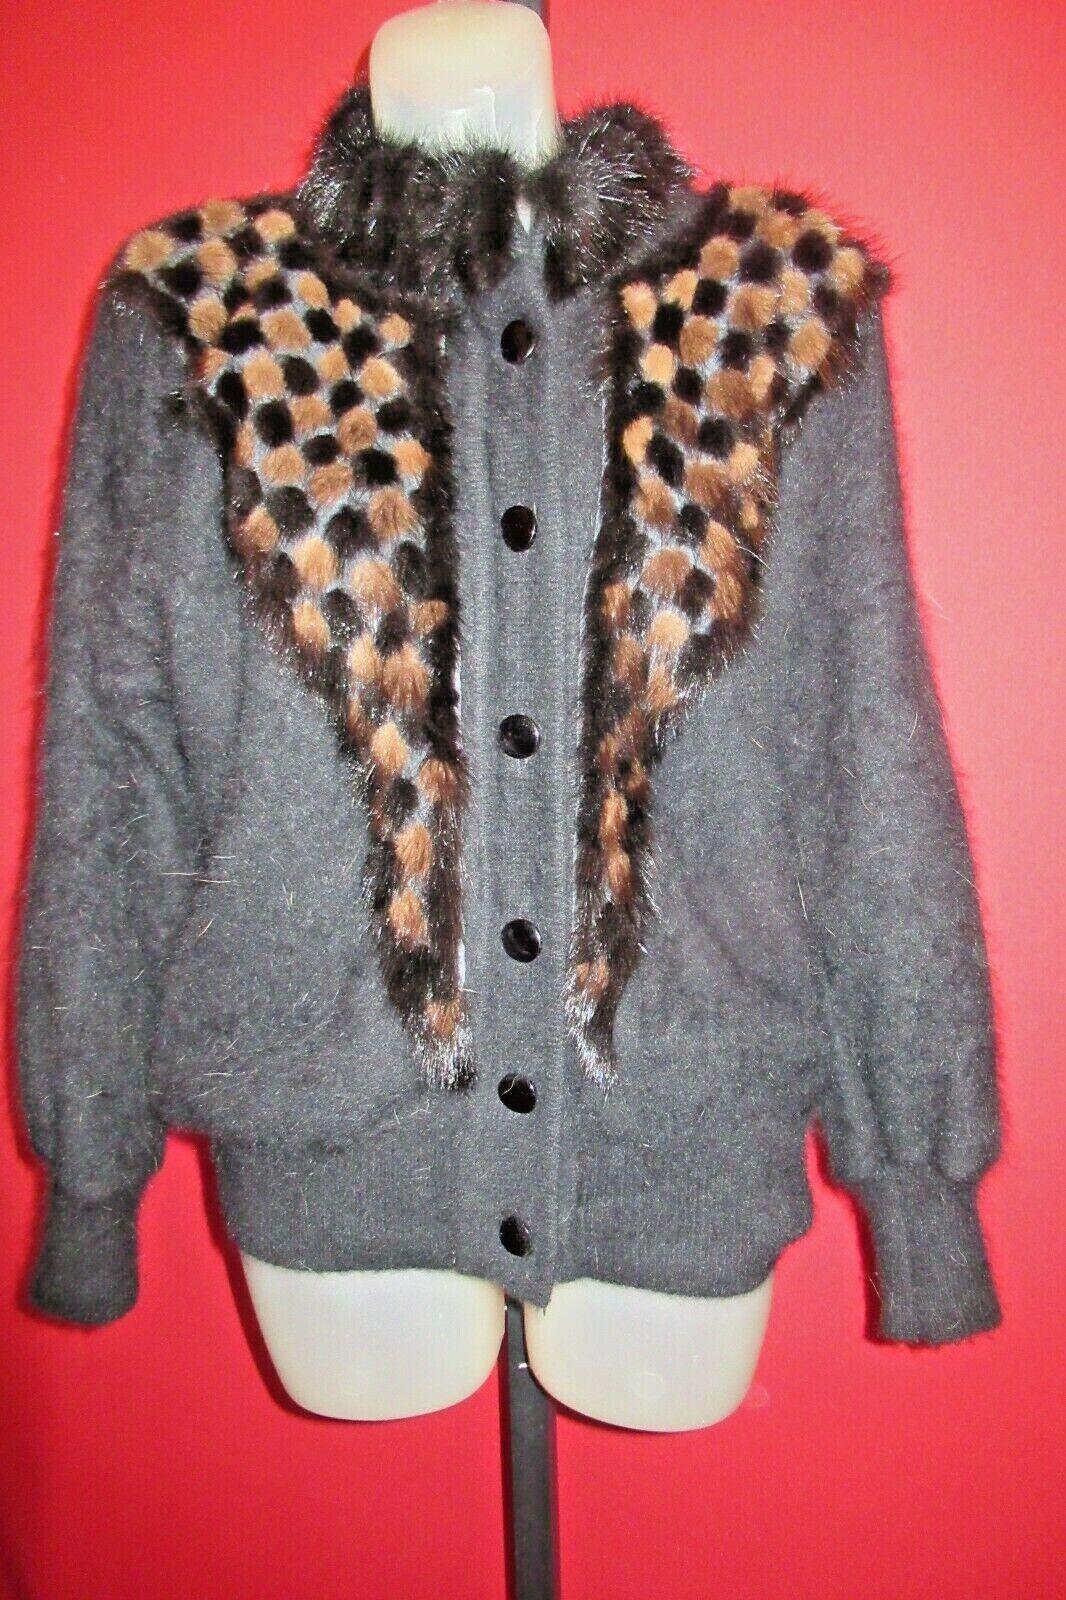 ~~C. C. International Black Brown Furry Hairy Angora Sweater Coat XL Satin Lined